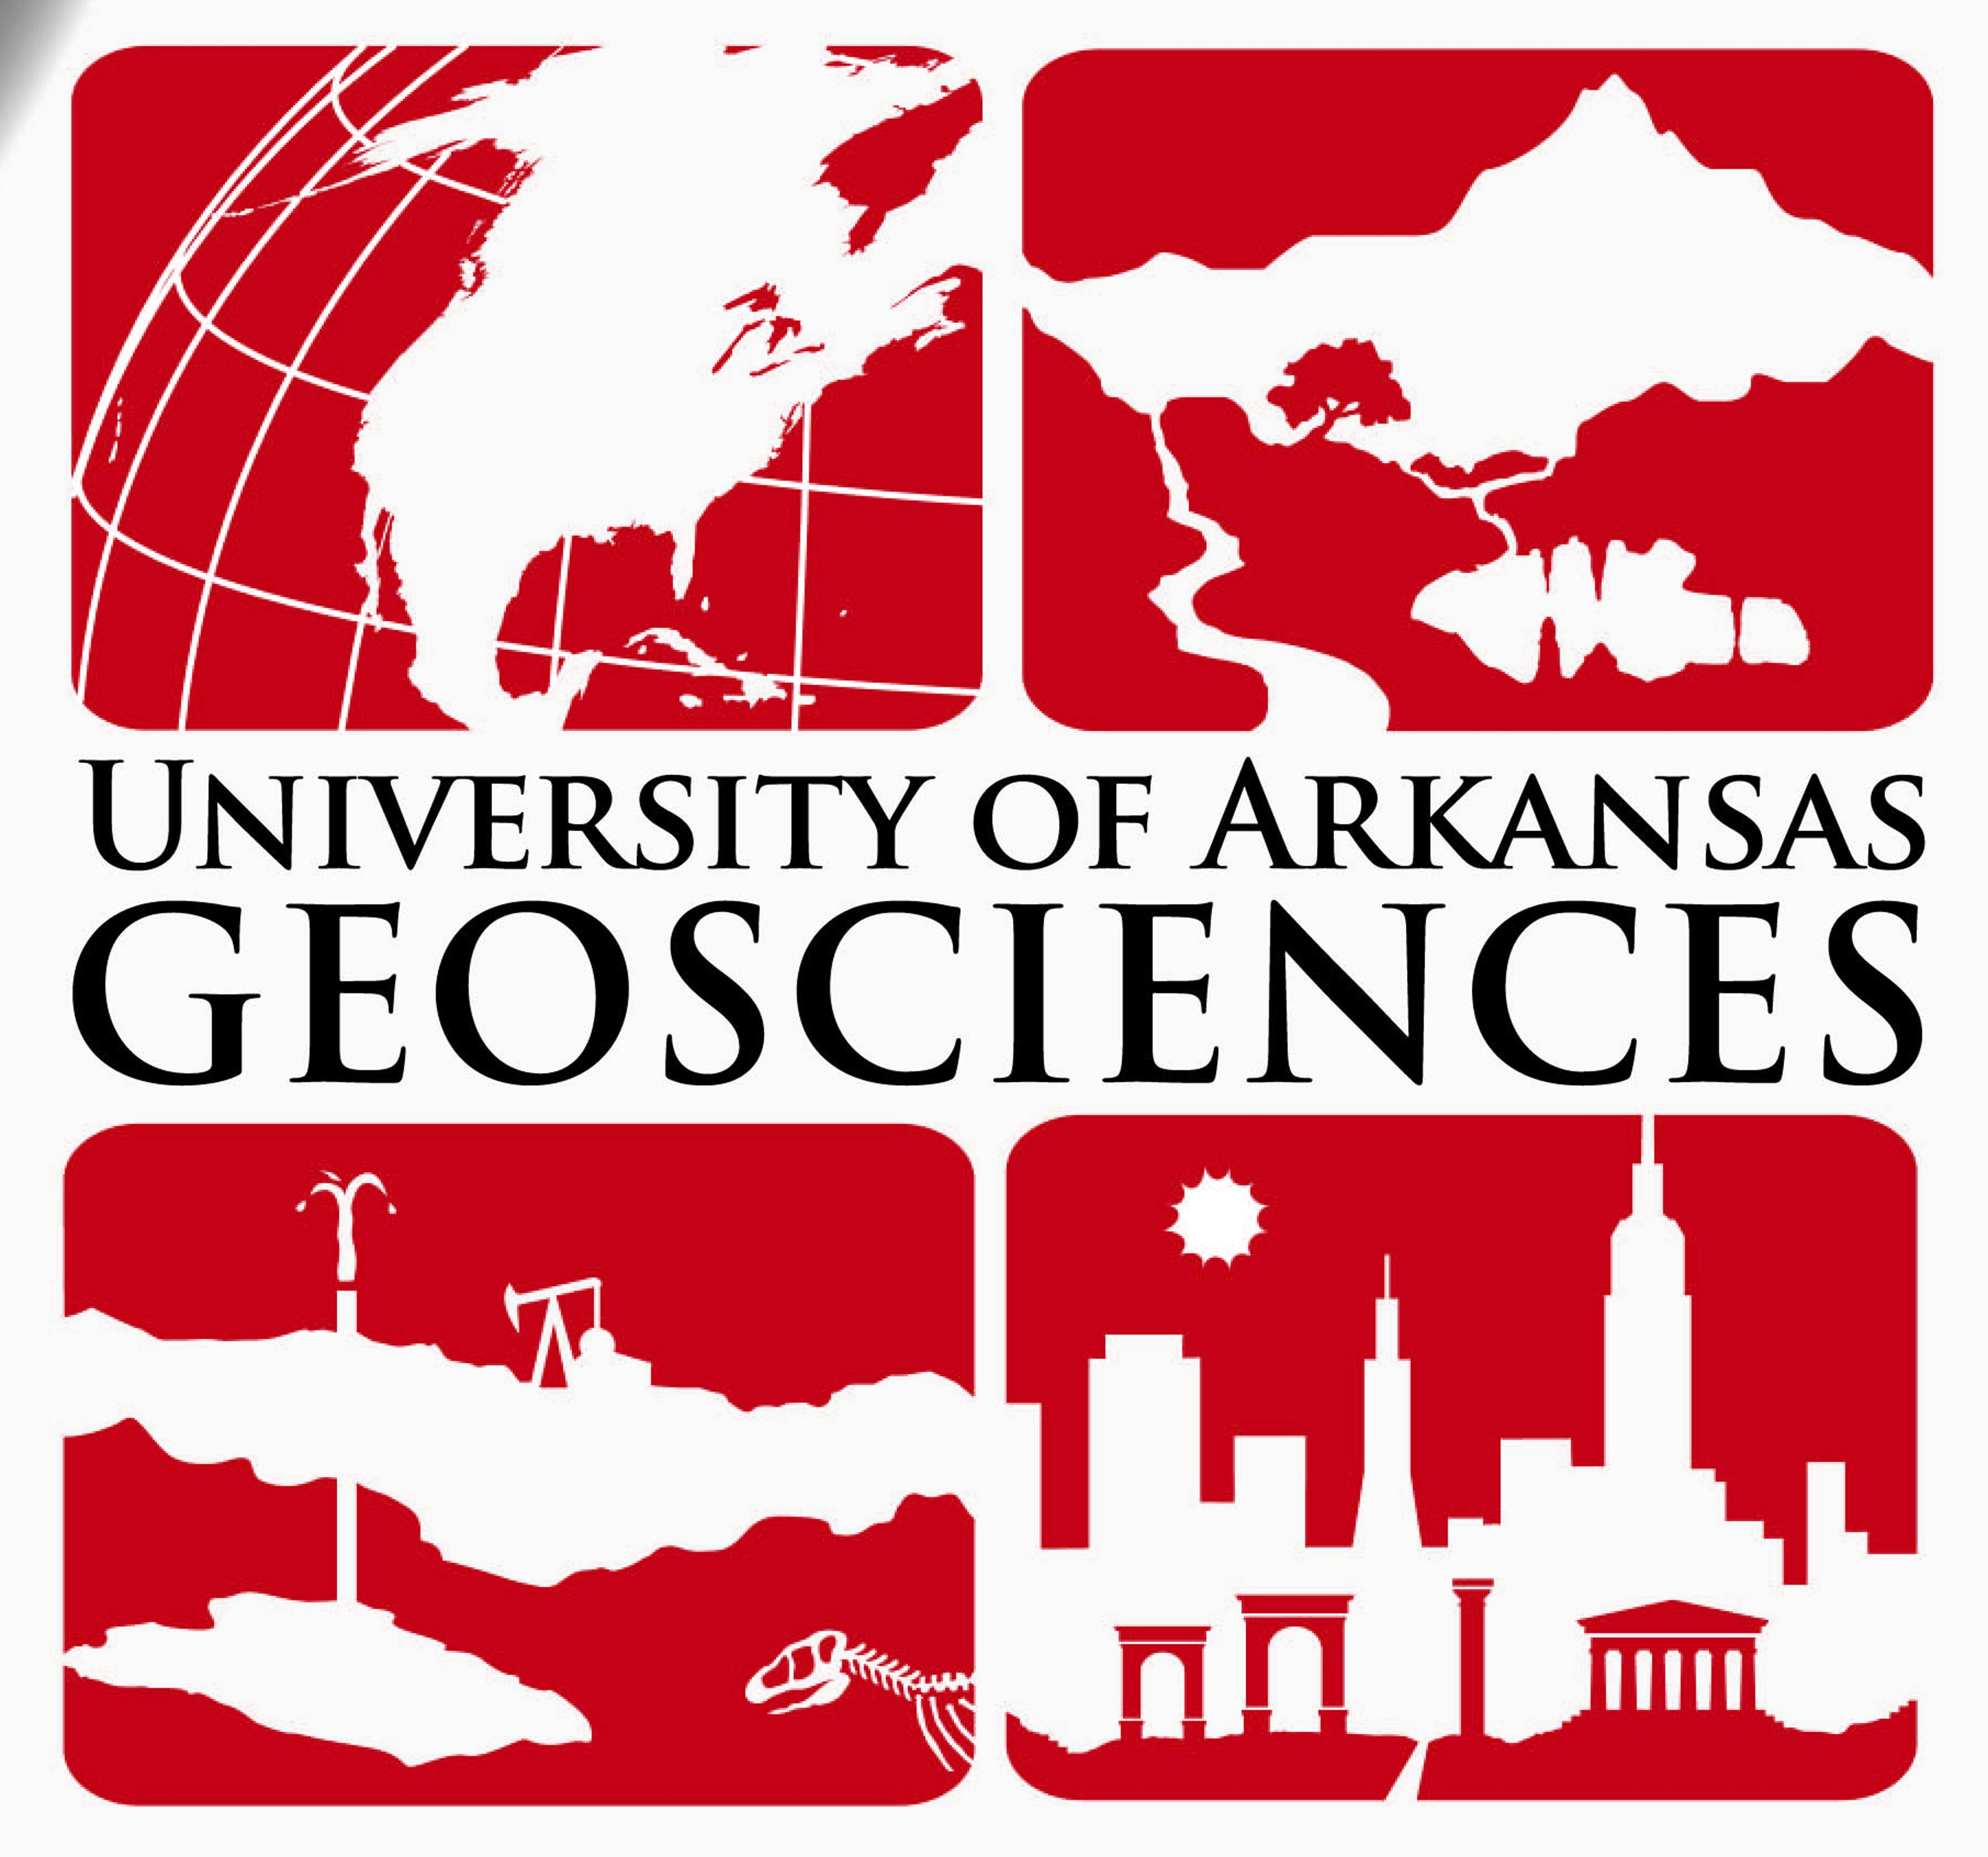 People university of arkansas ms university of arkansas petroleum geology chrismoyer3gmail sciox Image collections